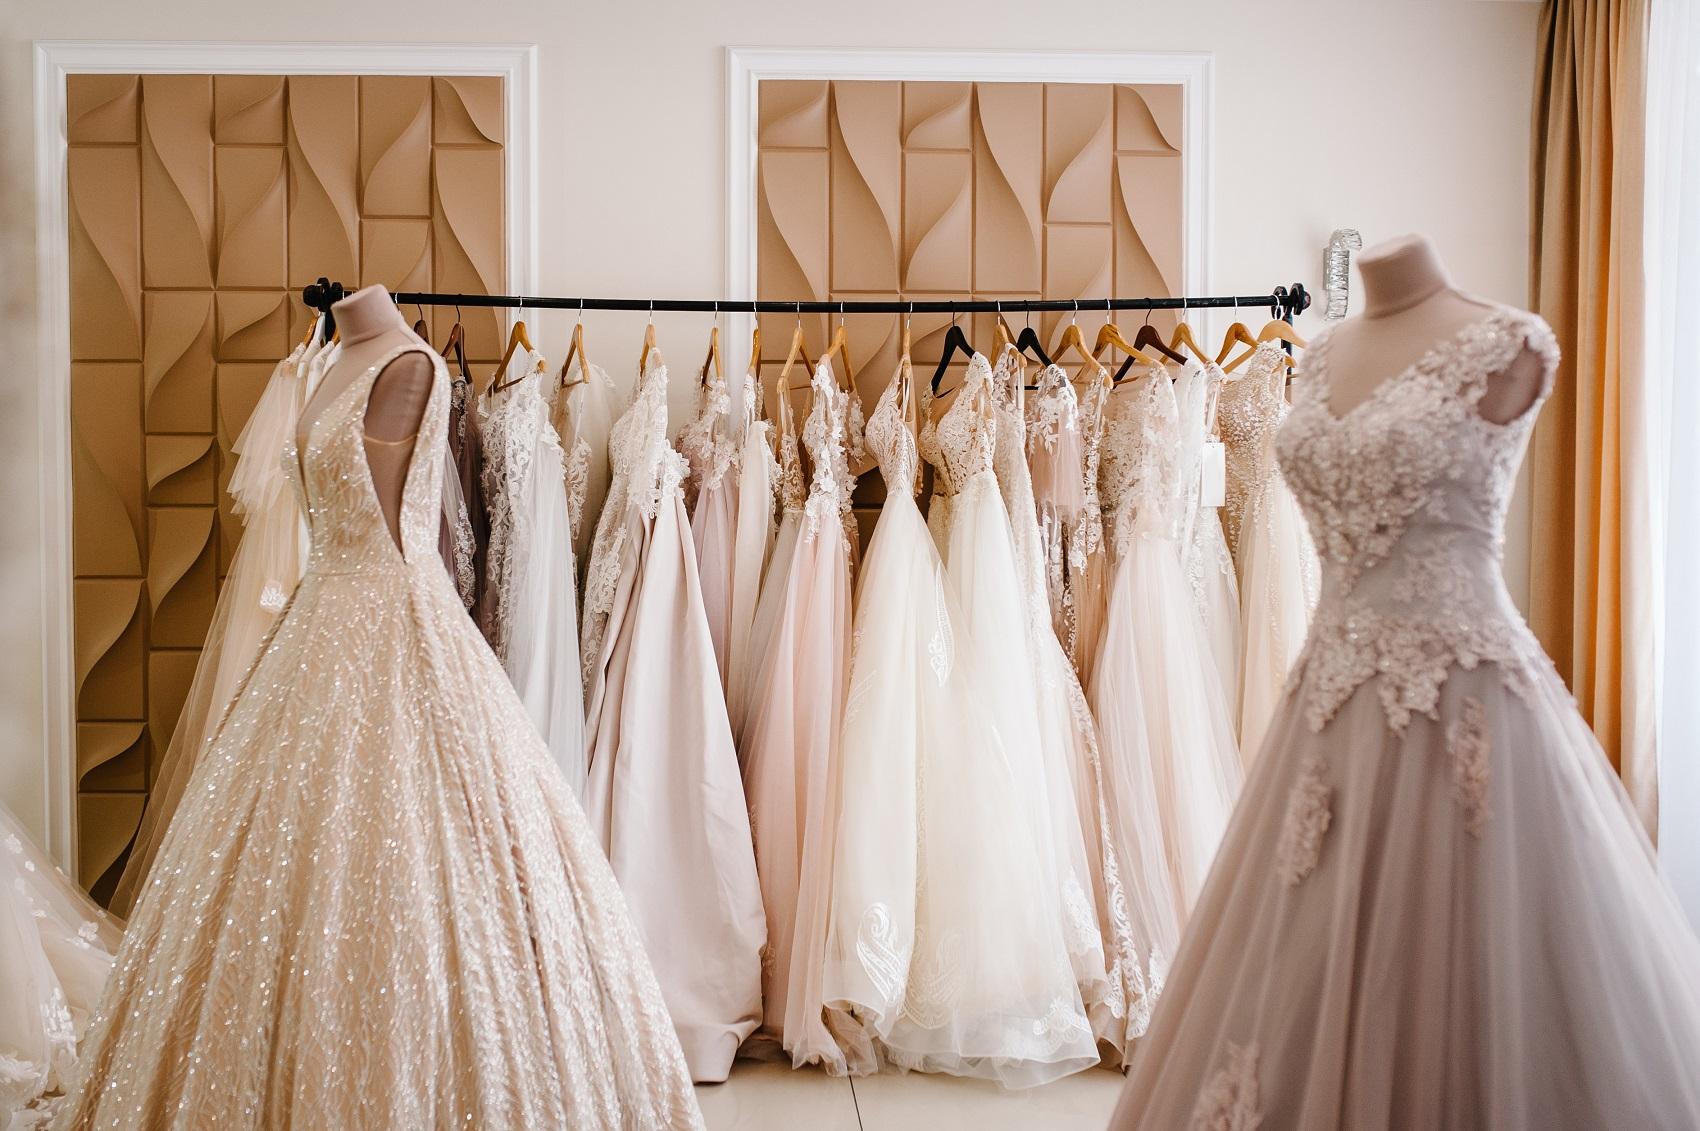 Consignment Wedding Dresses Red Deer Bestweddingdresses,Casual White Beach Wedding Dress